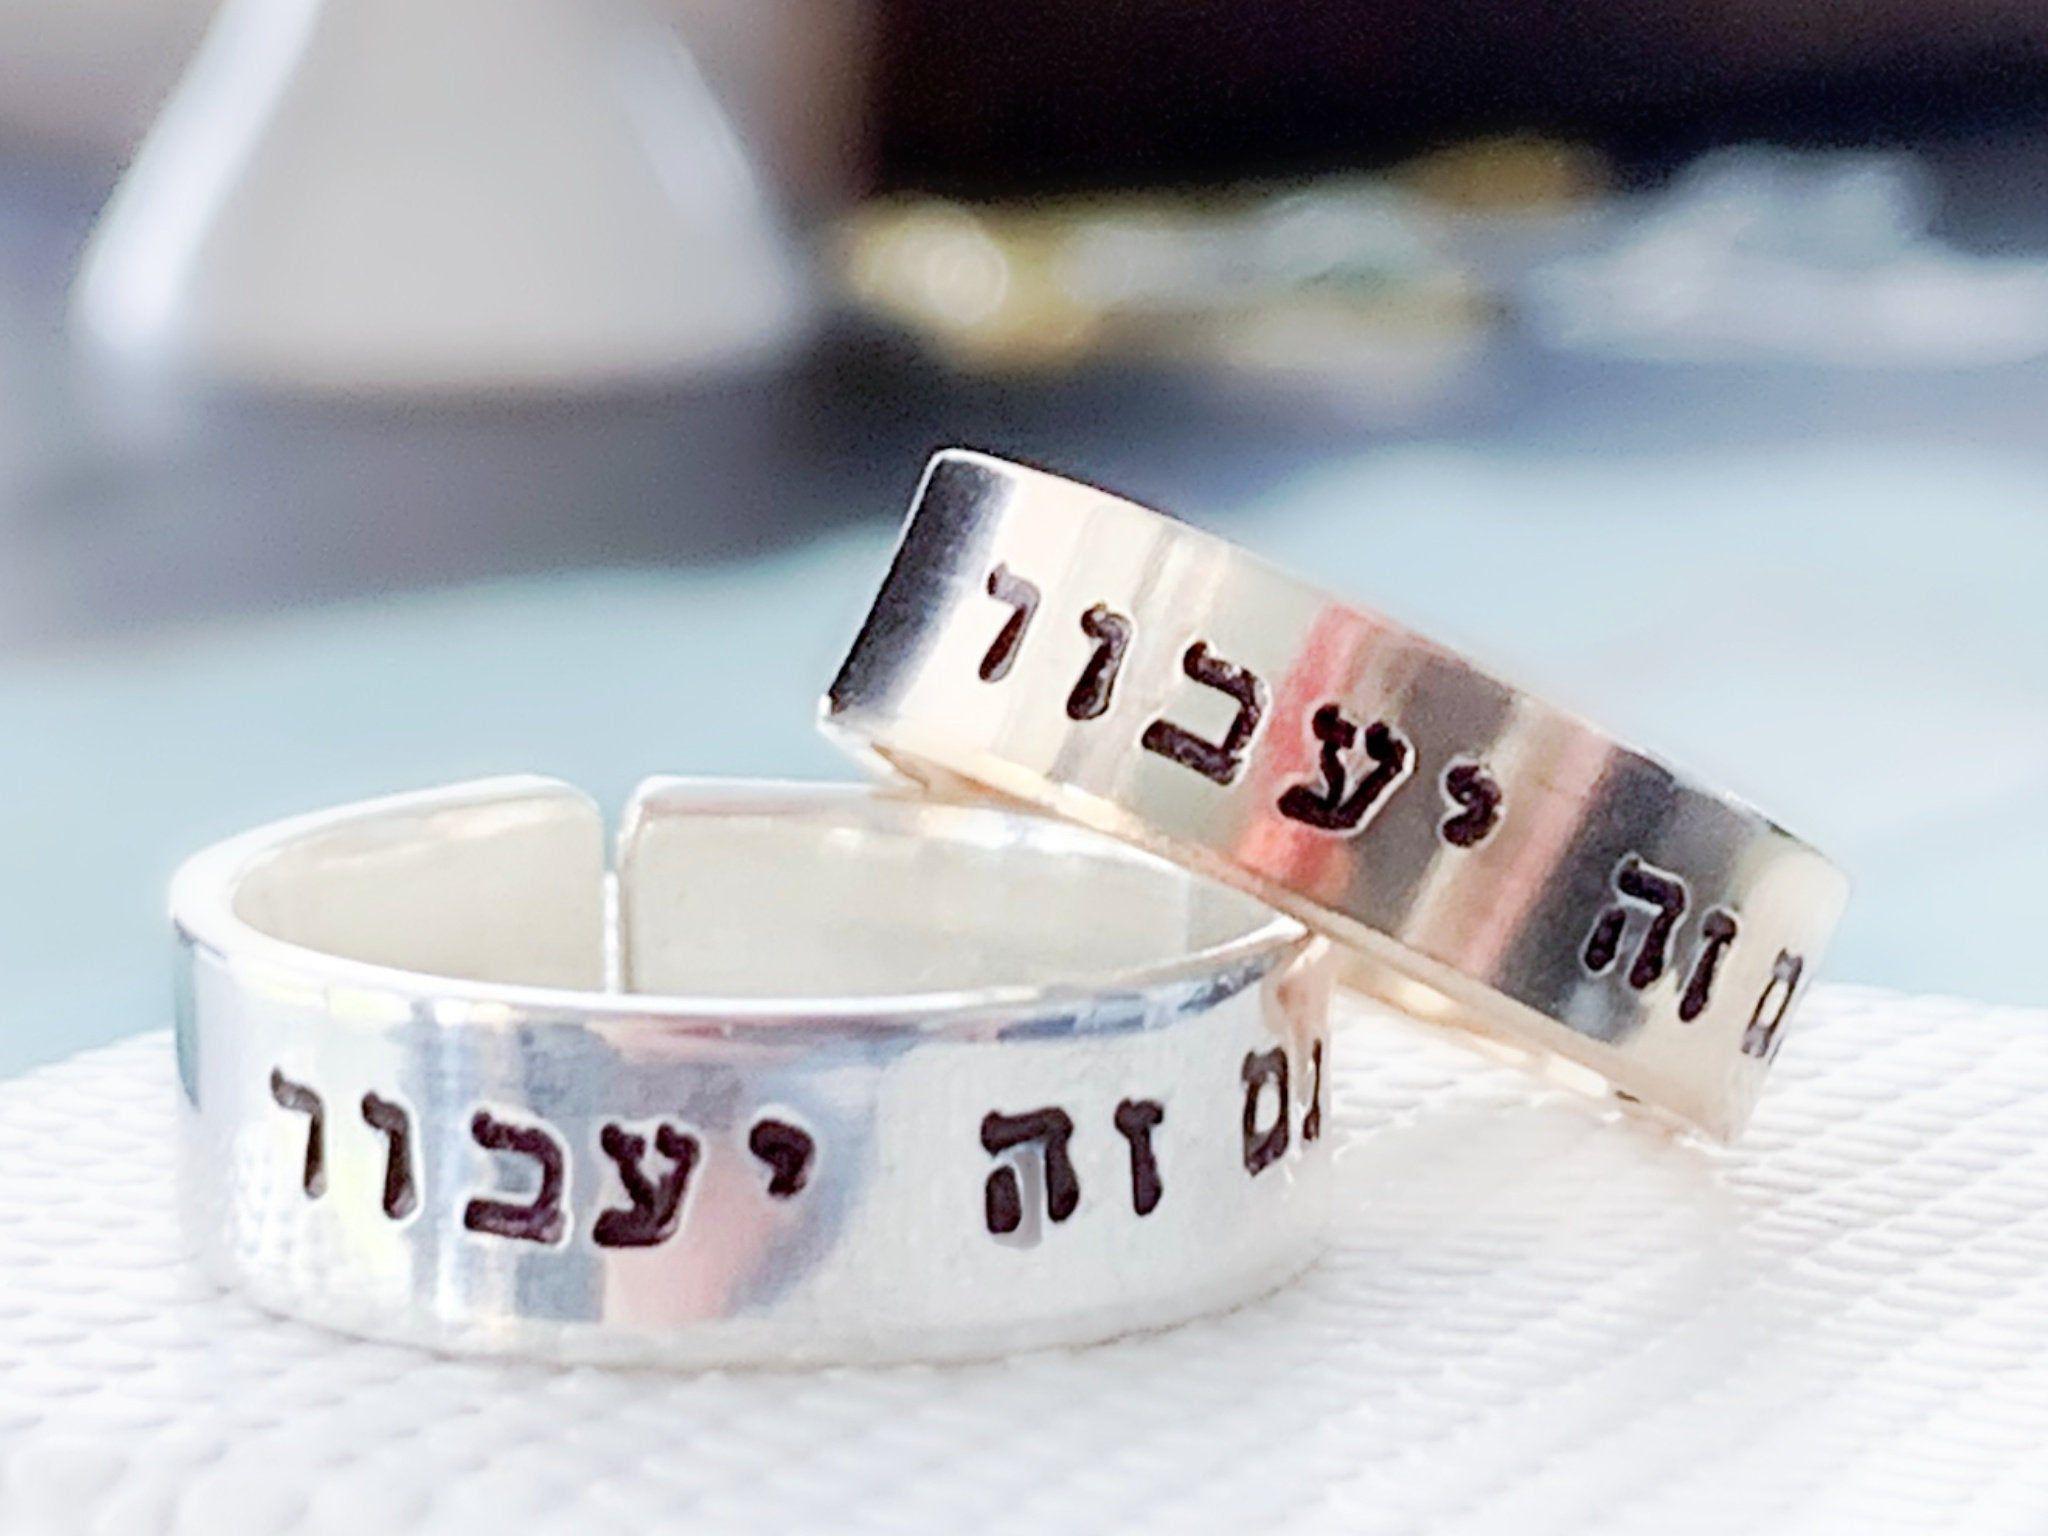 Hebrew Ring Jewish gift Popular Ring Inspirational Ring 925 silver ring This too shall pass Ring Jewish ring